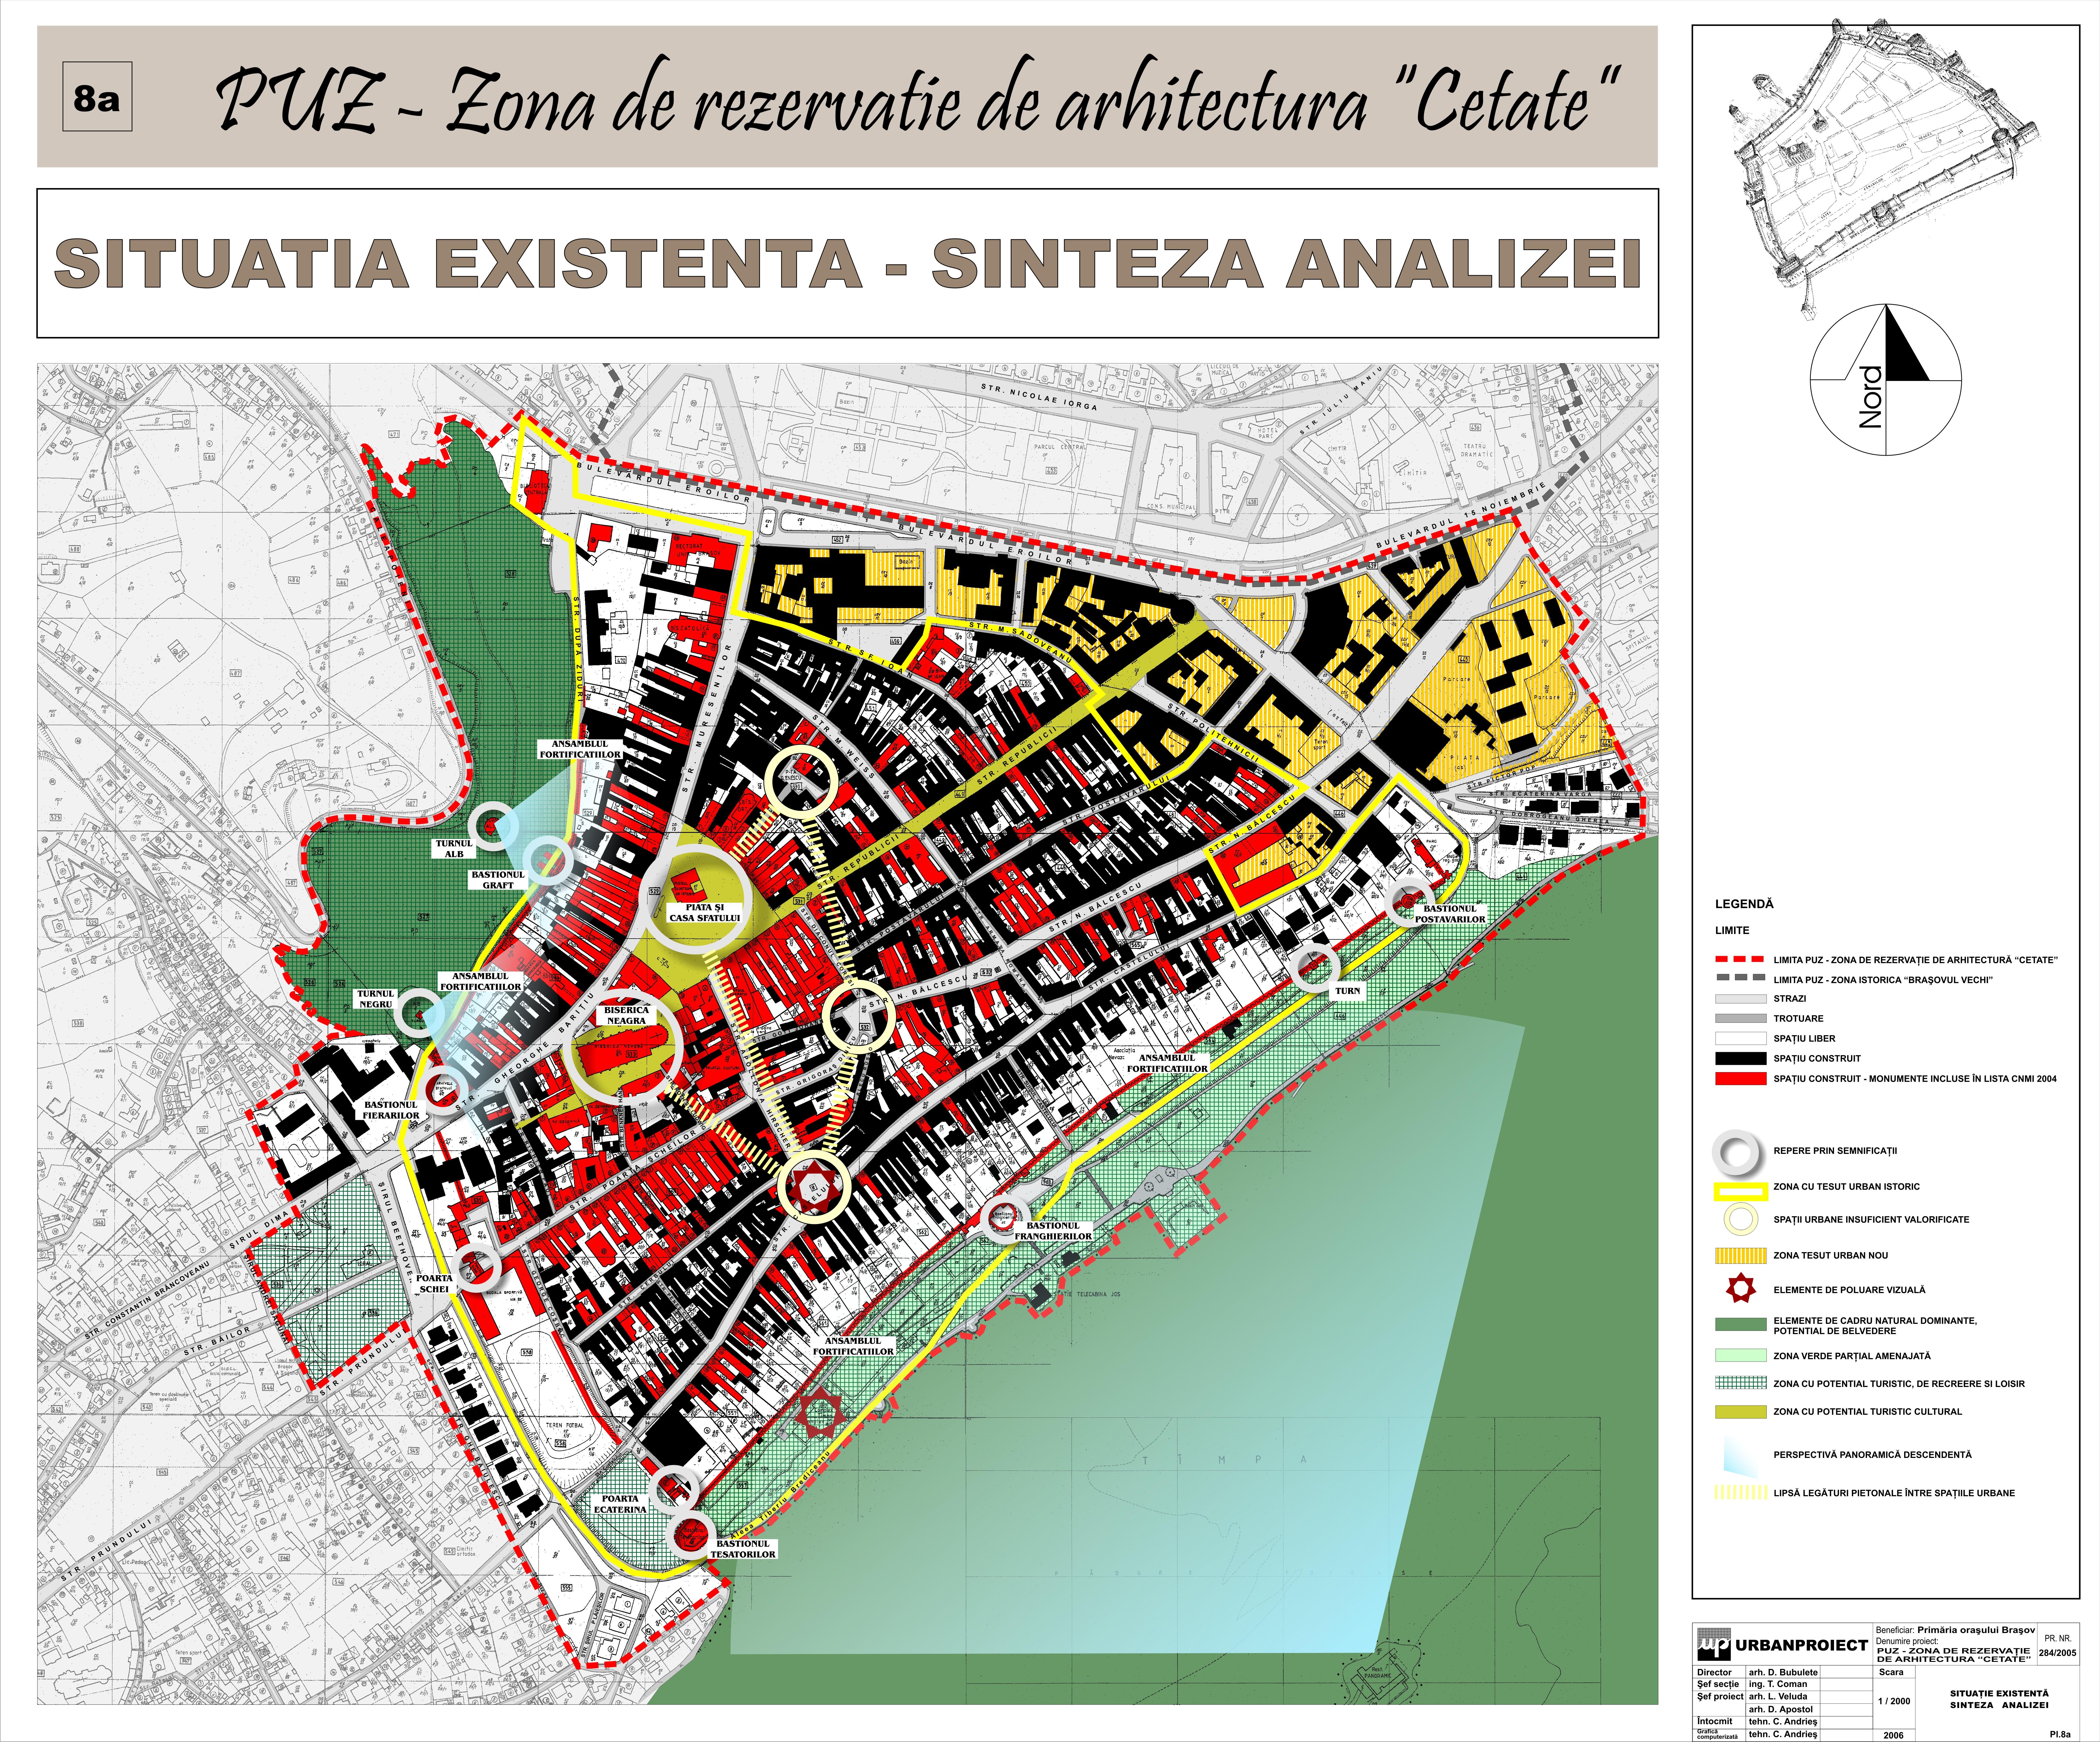 8a_EXISTENT_SINTEZA_ANALIZEI